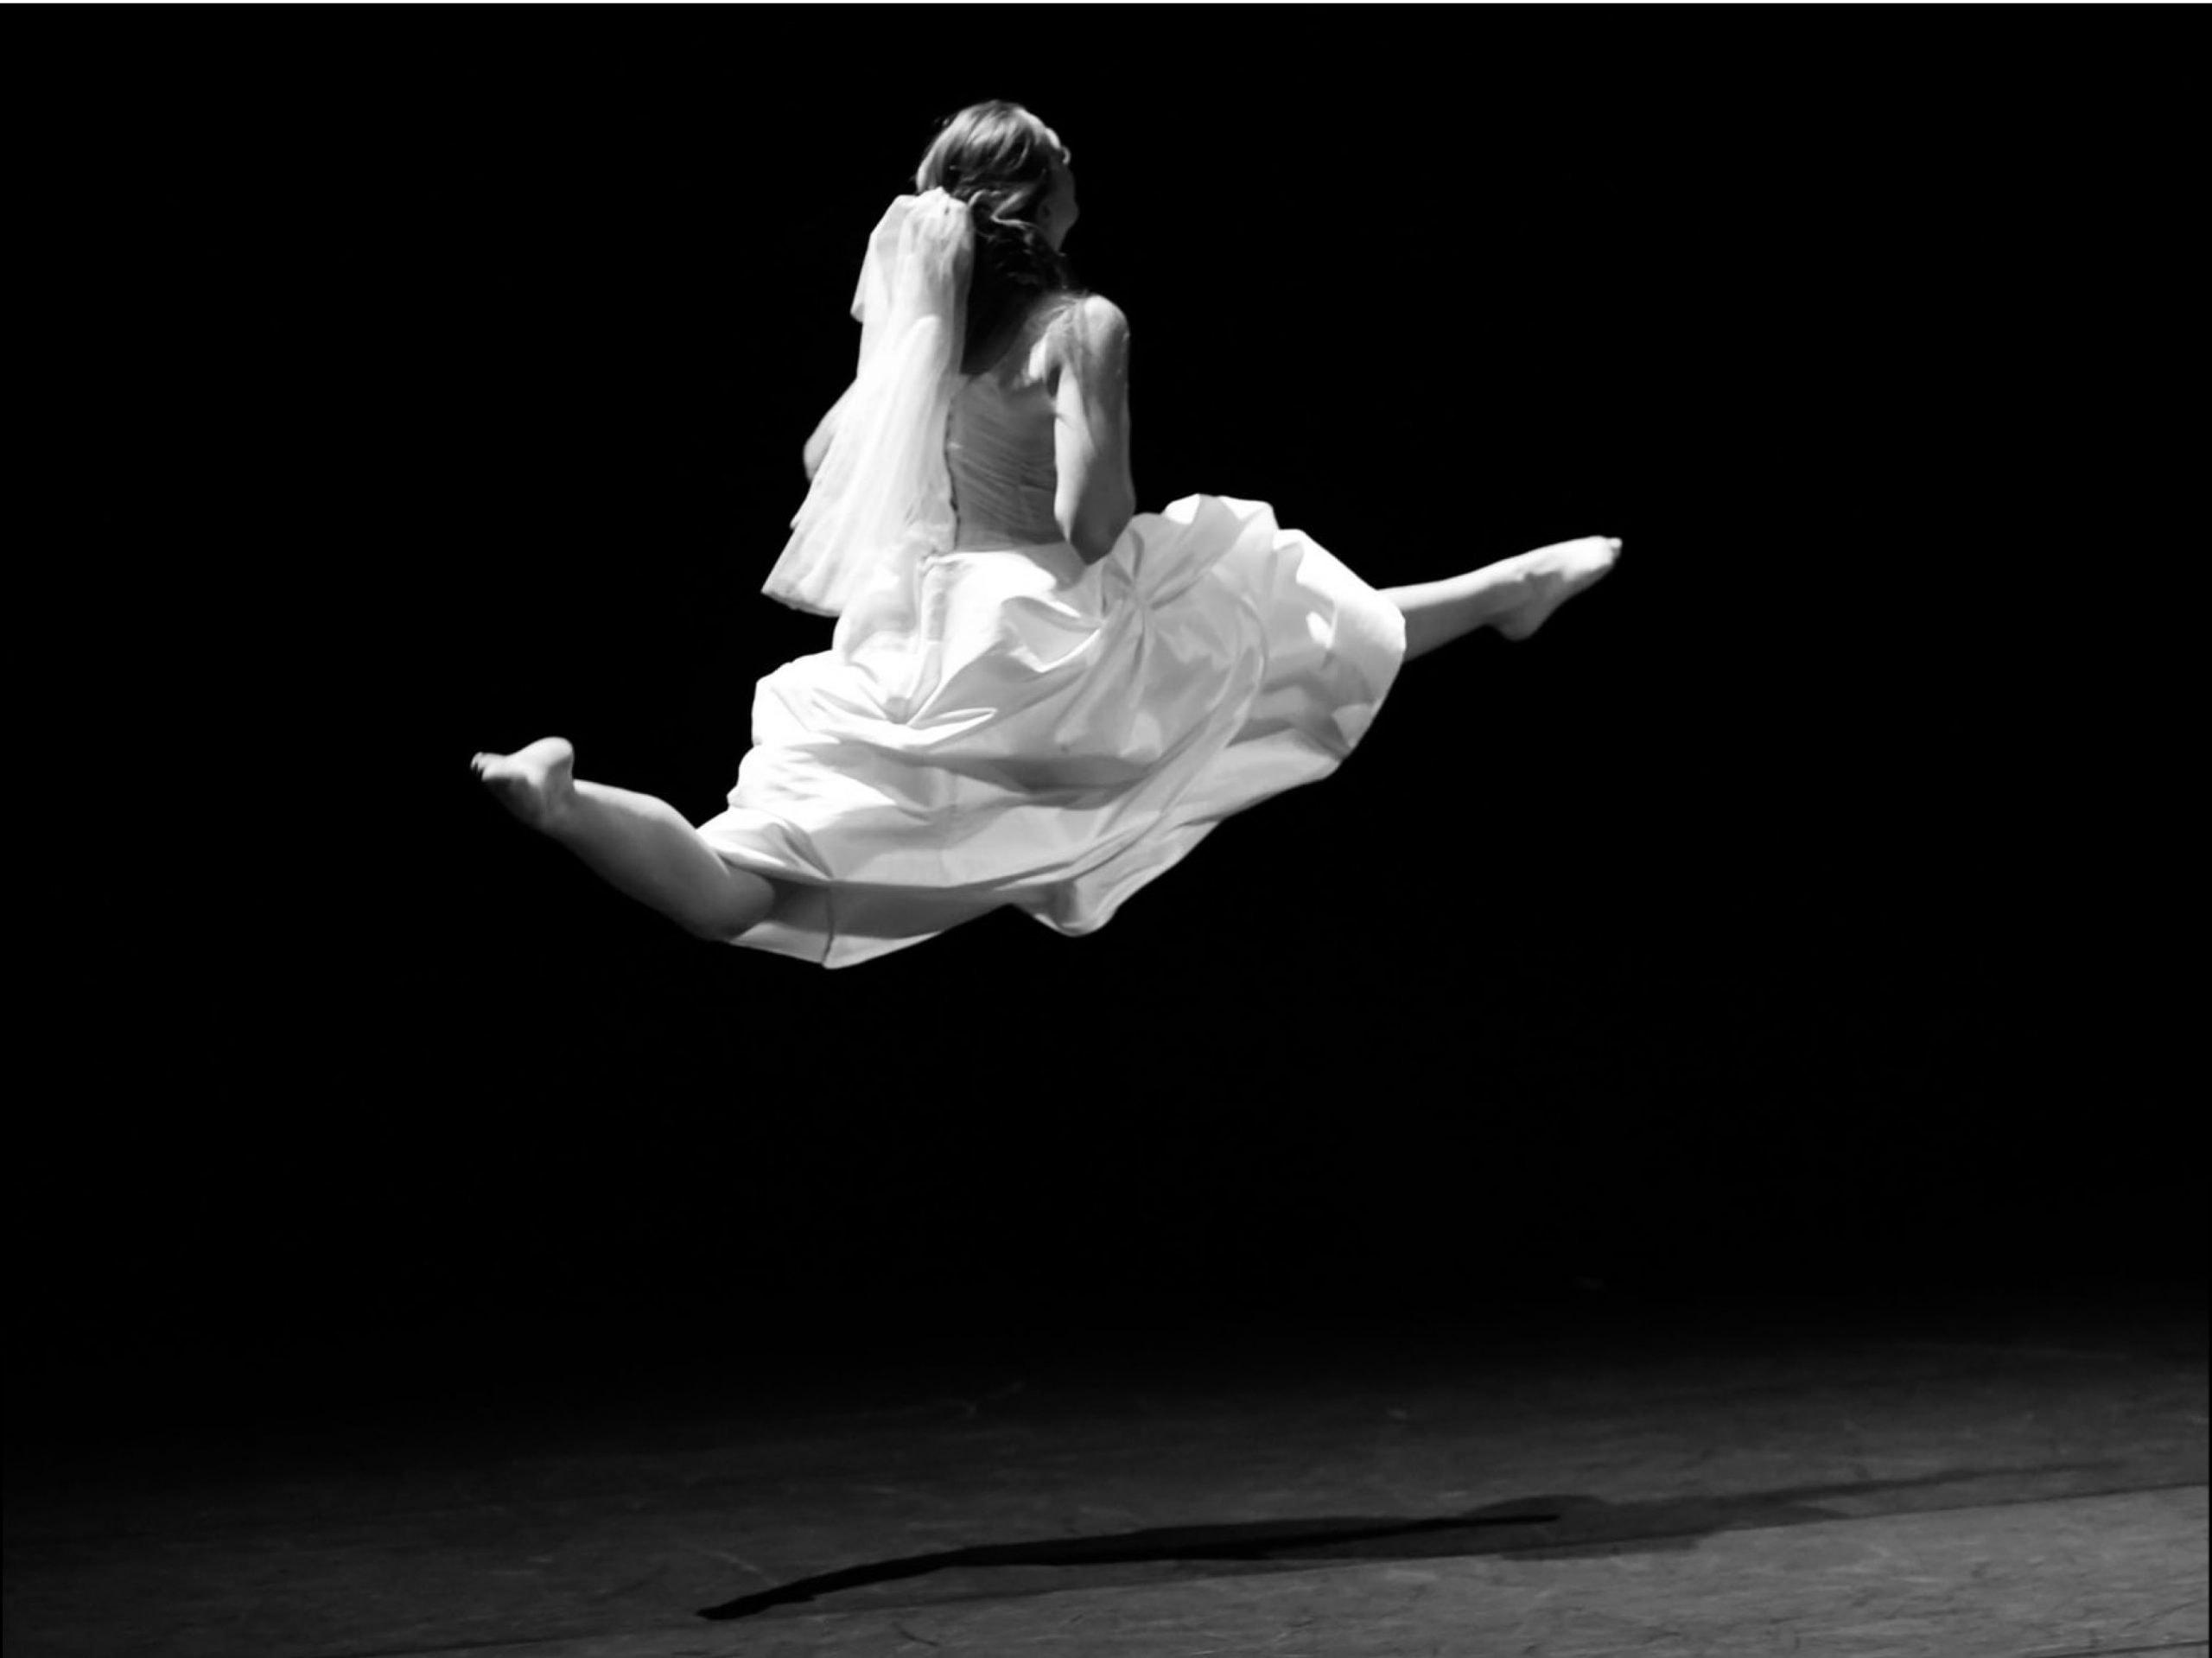 Company V Balletschool Veronique lenaers_ slider 4